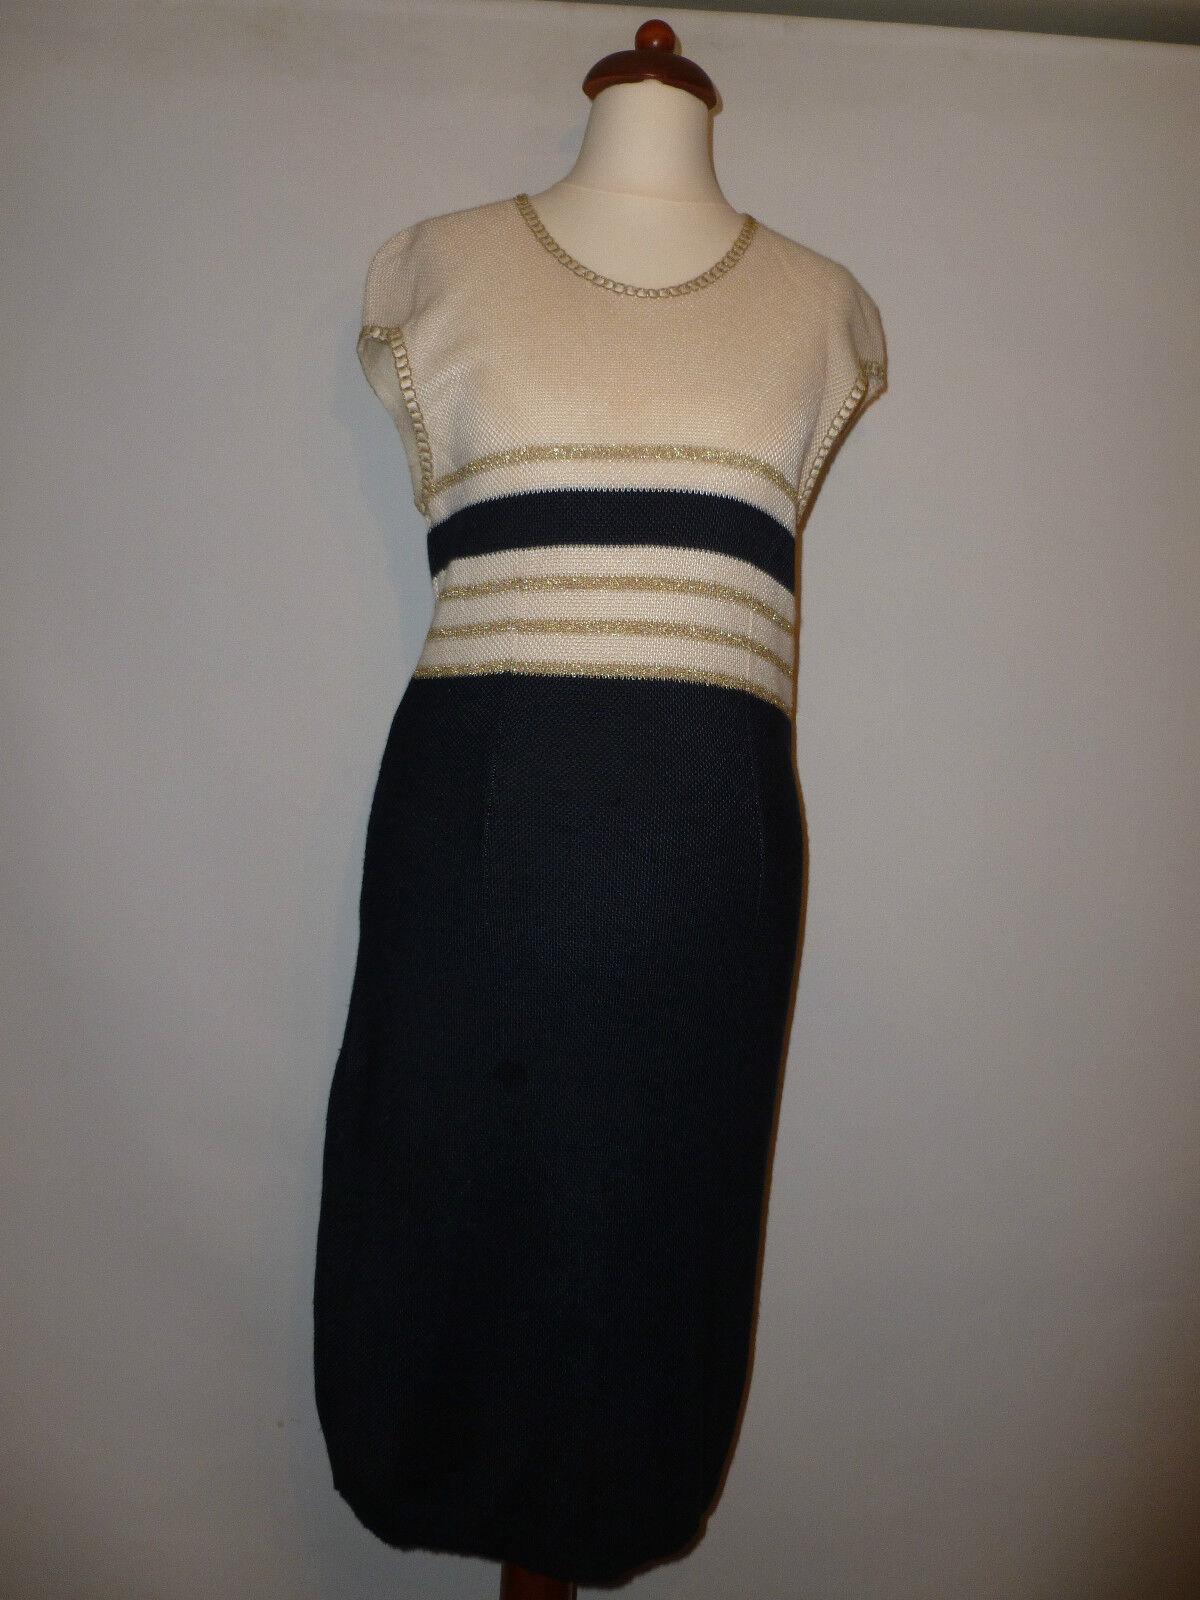 LADIES HAUBER GERMANY VINTAGE  KNITTED  DRESS - - SIZE